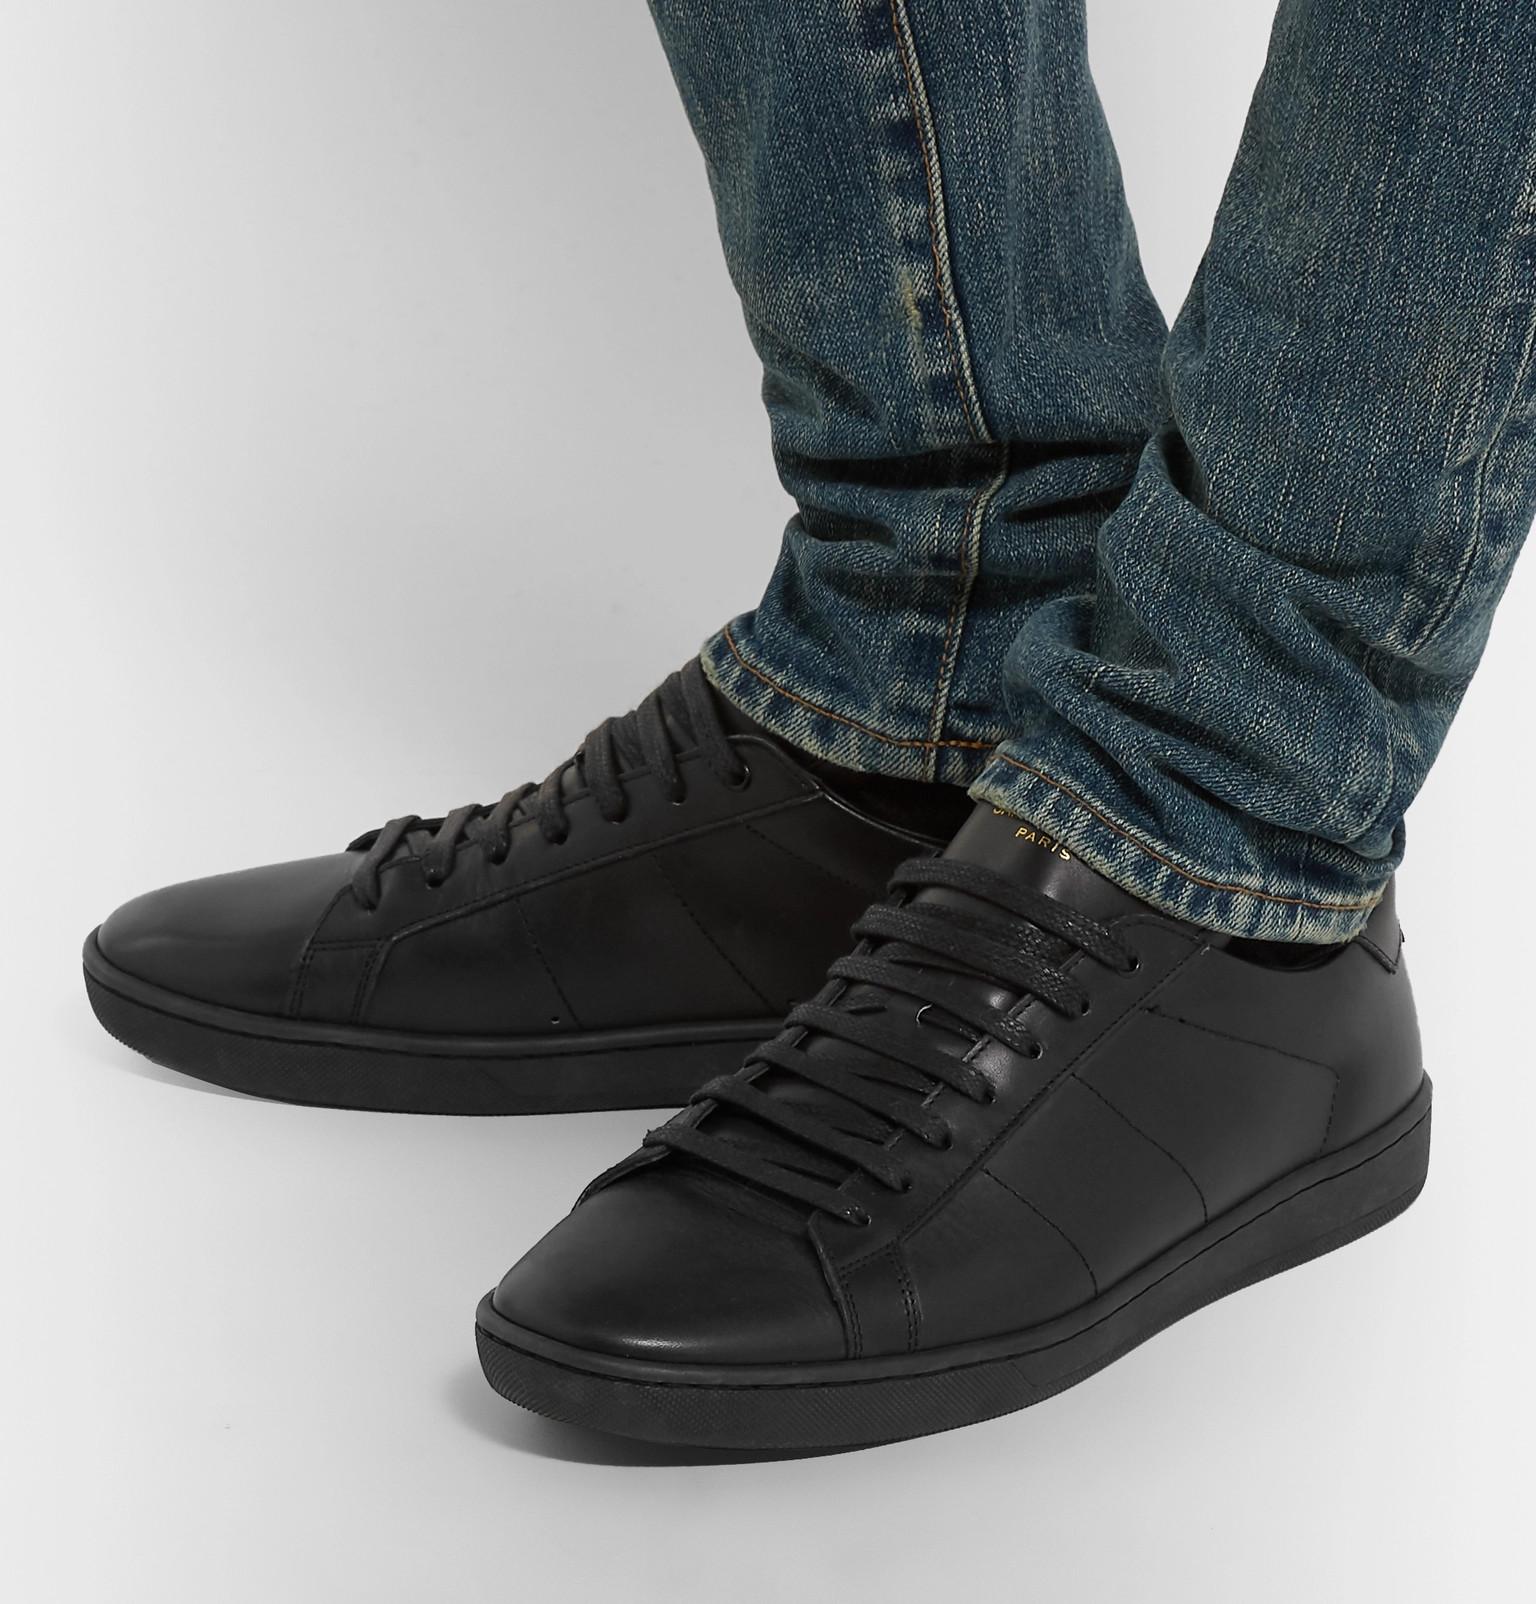 13eb0b10e2948 SAINT LAURENT - SL/01 Court Classic Leather Sneakers